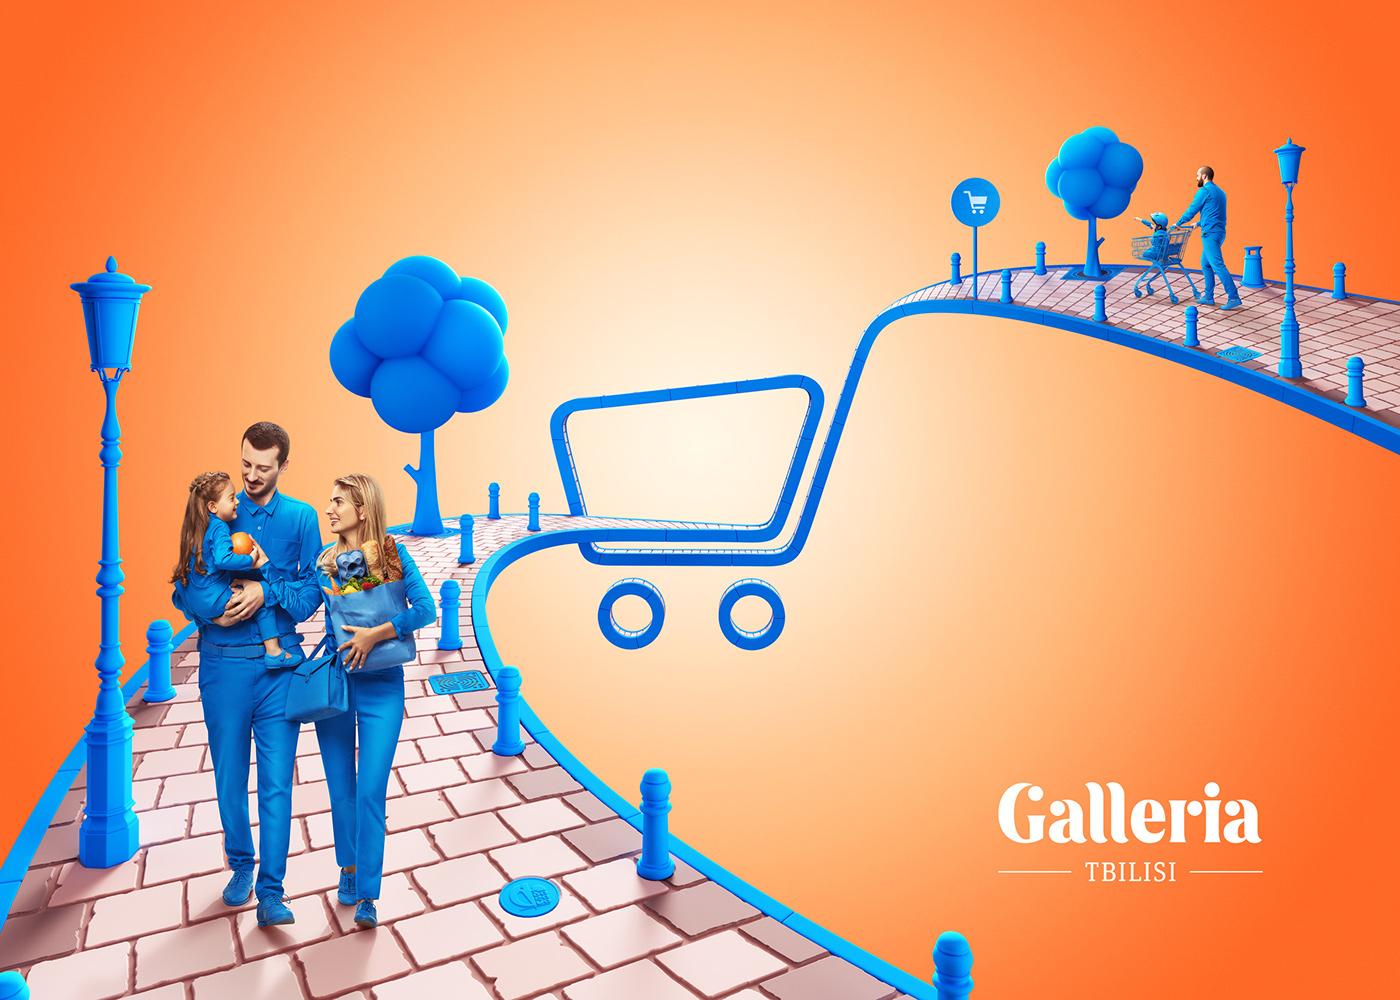 Shopping Entertainment CGI ILLUSTRATION  Digital Art  people lifestyle graphic design  poster retouching